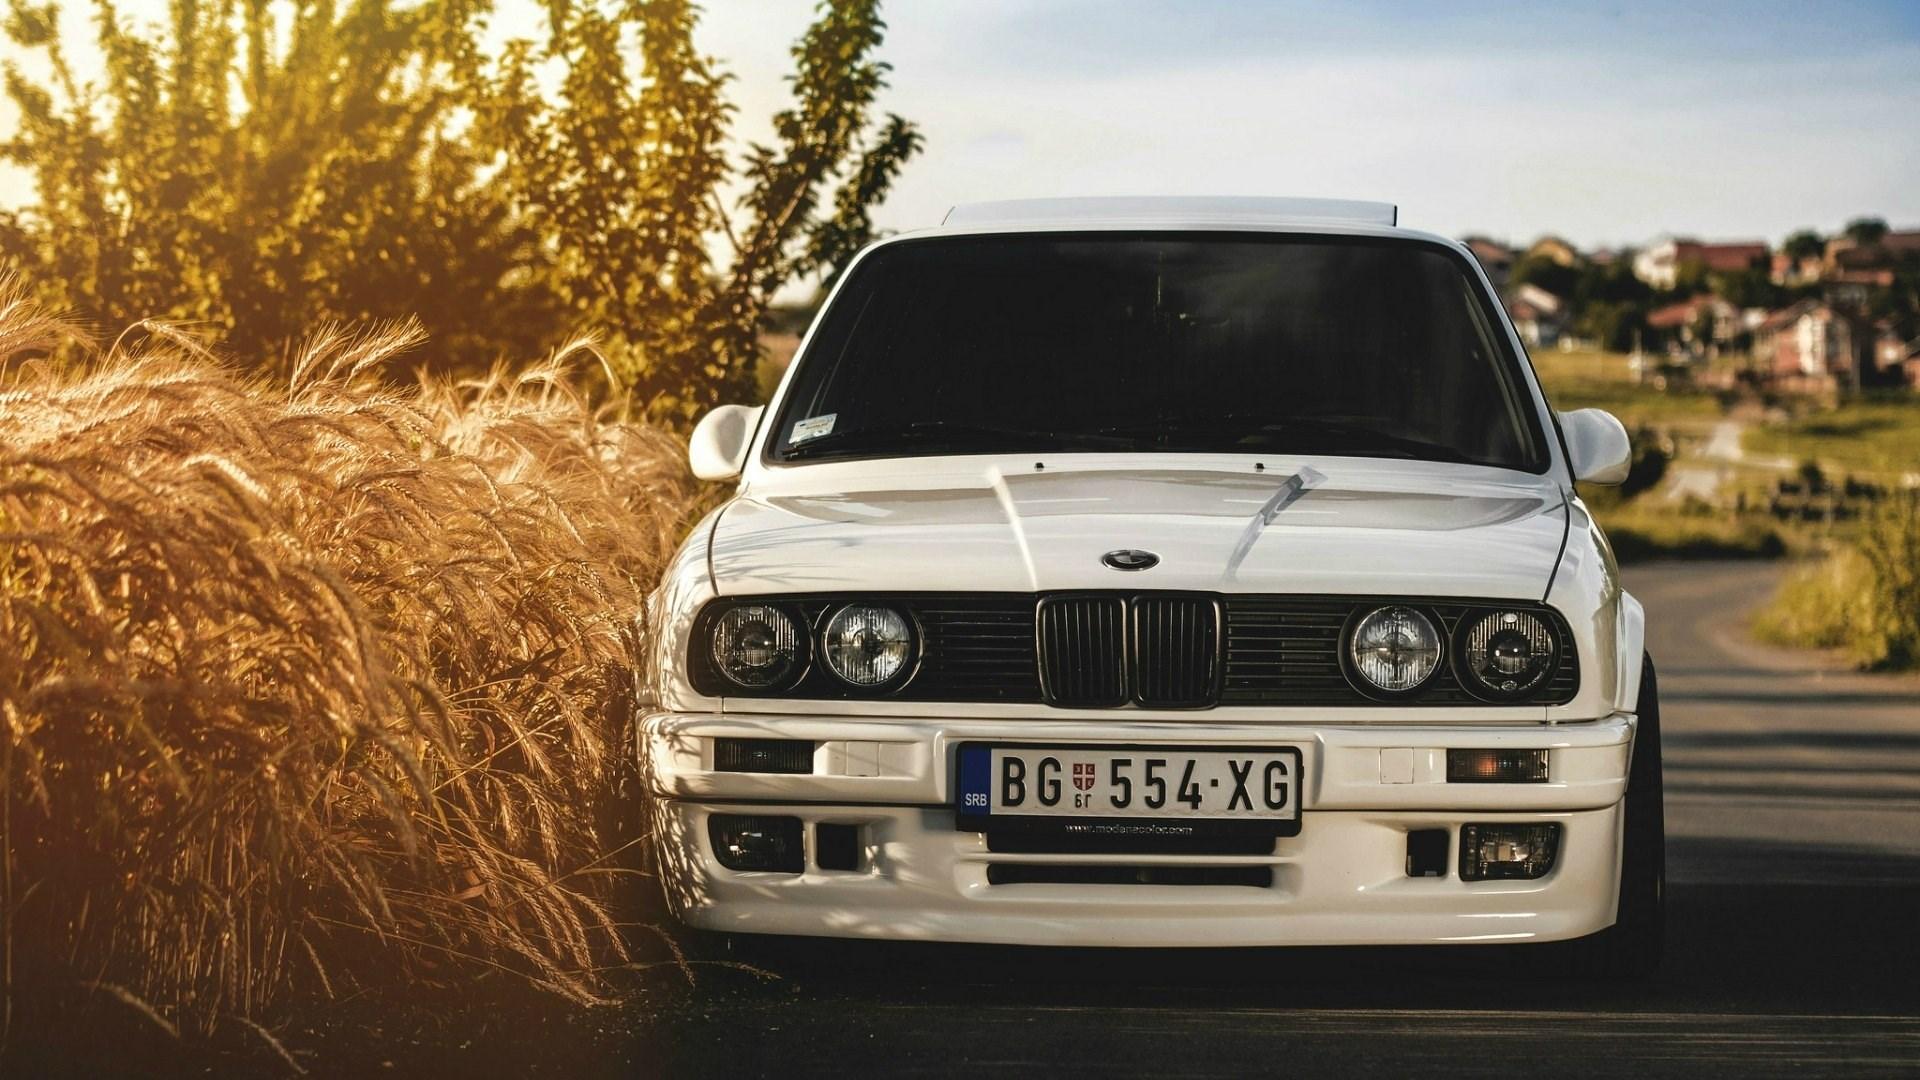 42+] BMW E30 Wallpaper HD on WallpaperSafari